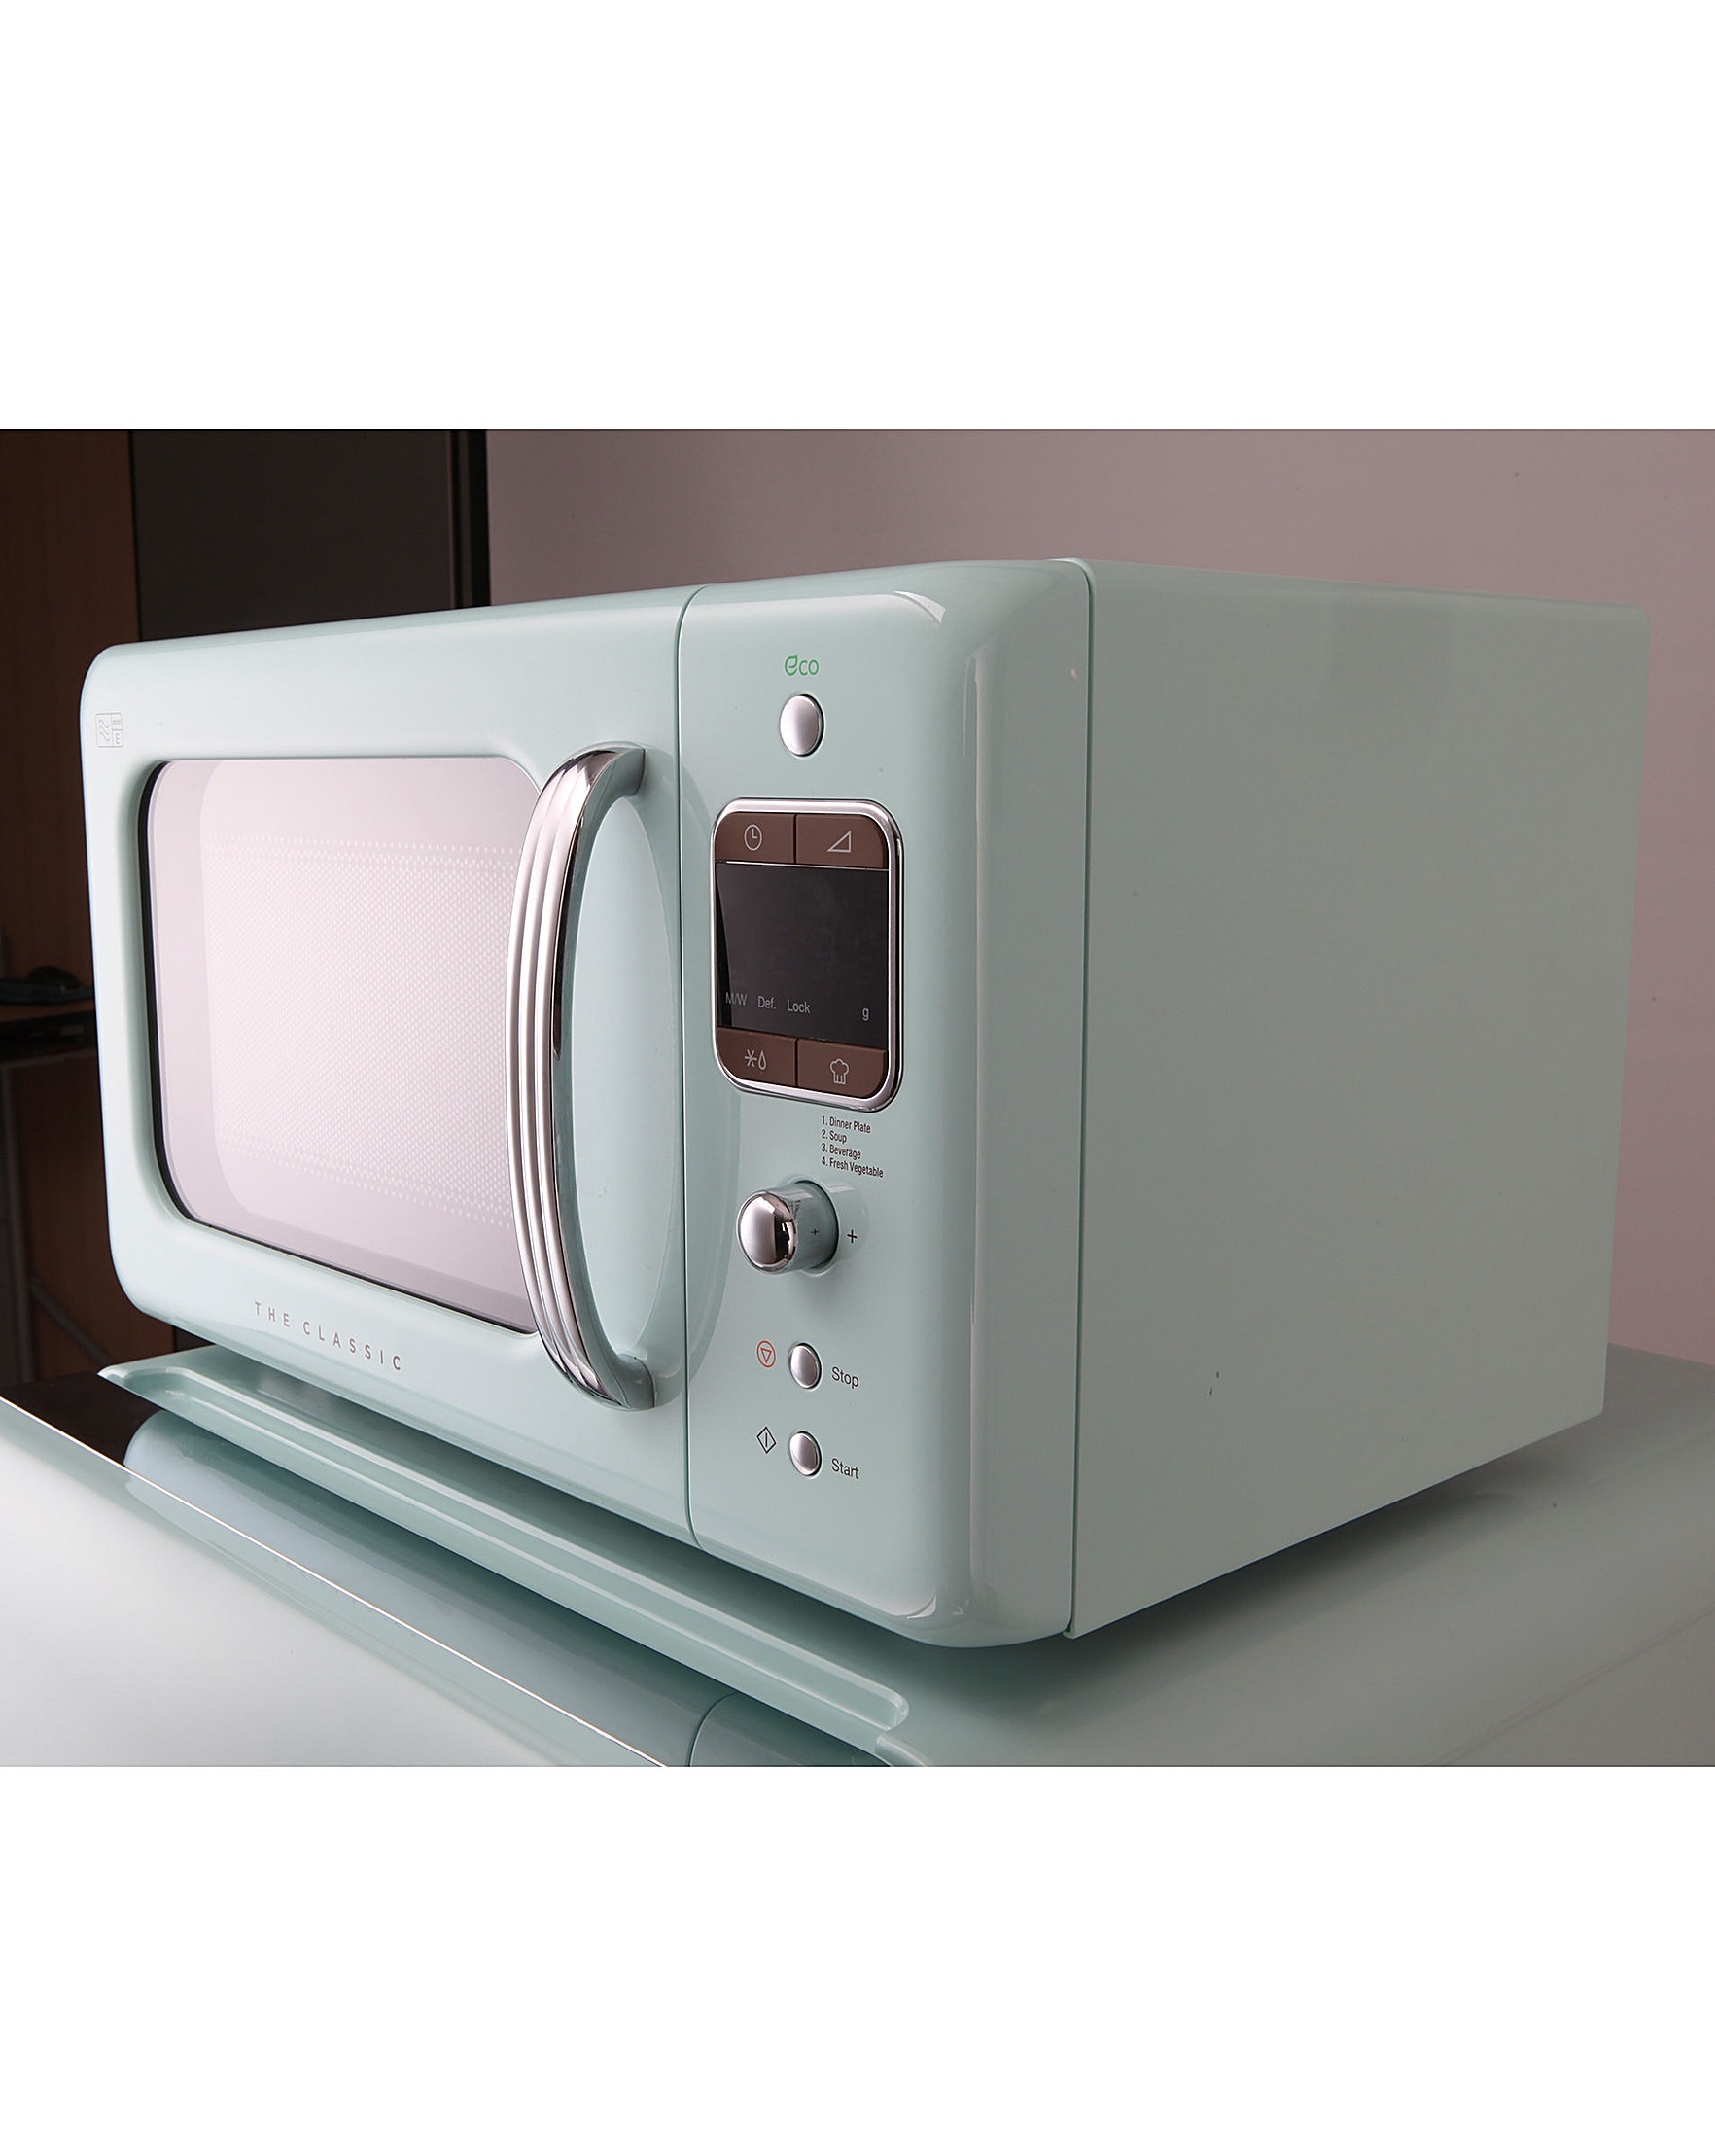 Microwave Daewoo - Microwave Baked Potato